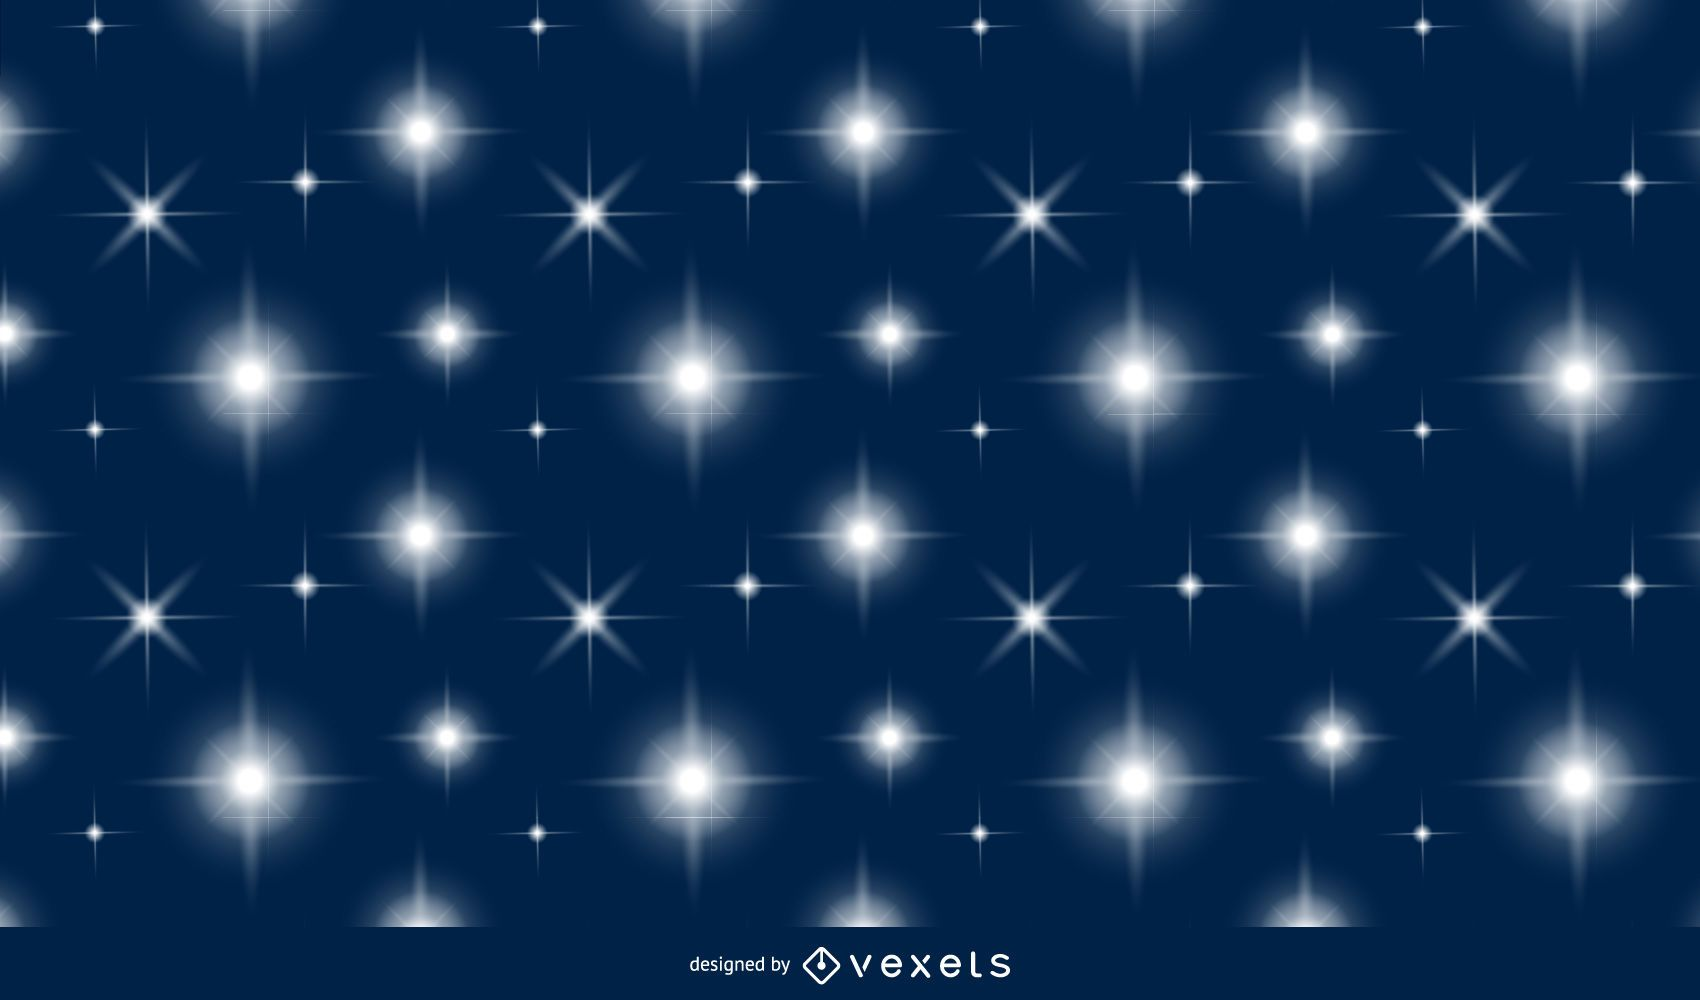 Star Photoshop And Illustrator Pattern